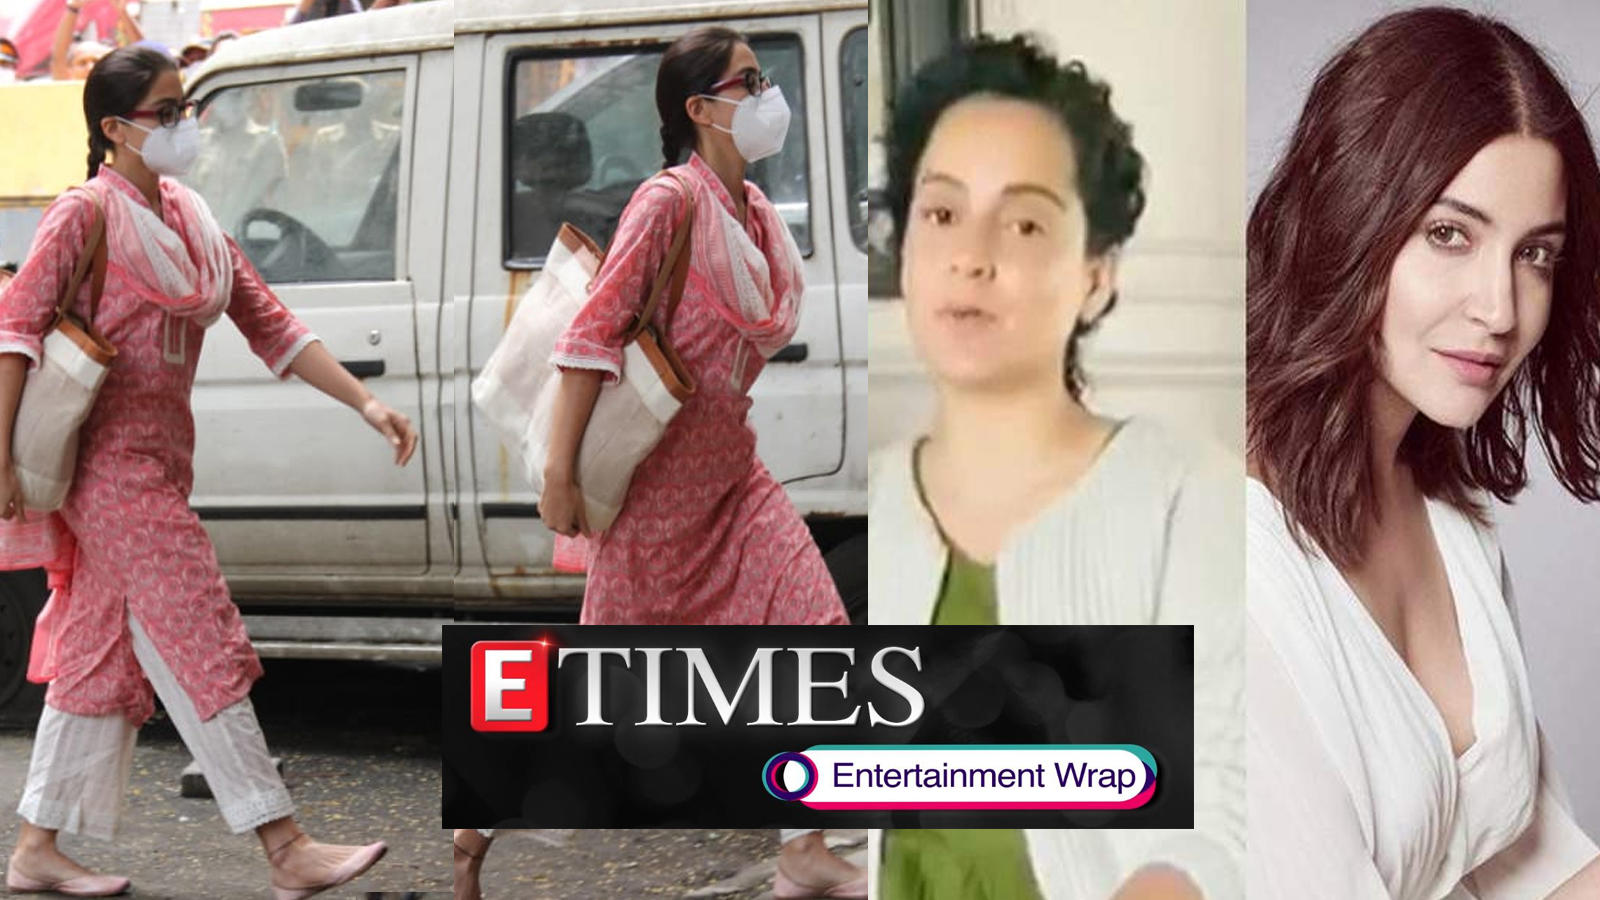 after-deepika-padukone-shraddha-kapoor-now-sara-ali-khan-at-ncb-office-in-drug-case-related-to-ssrs-death-kangana-ranaut-accuses-anushka-sharma-of-selective-feminism-and-more-